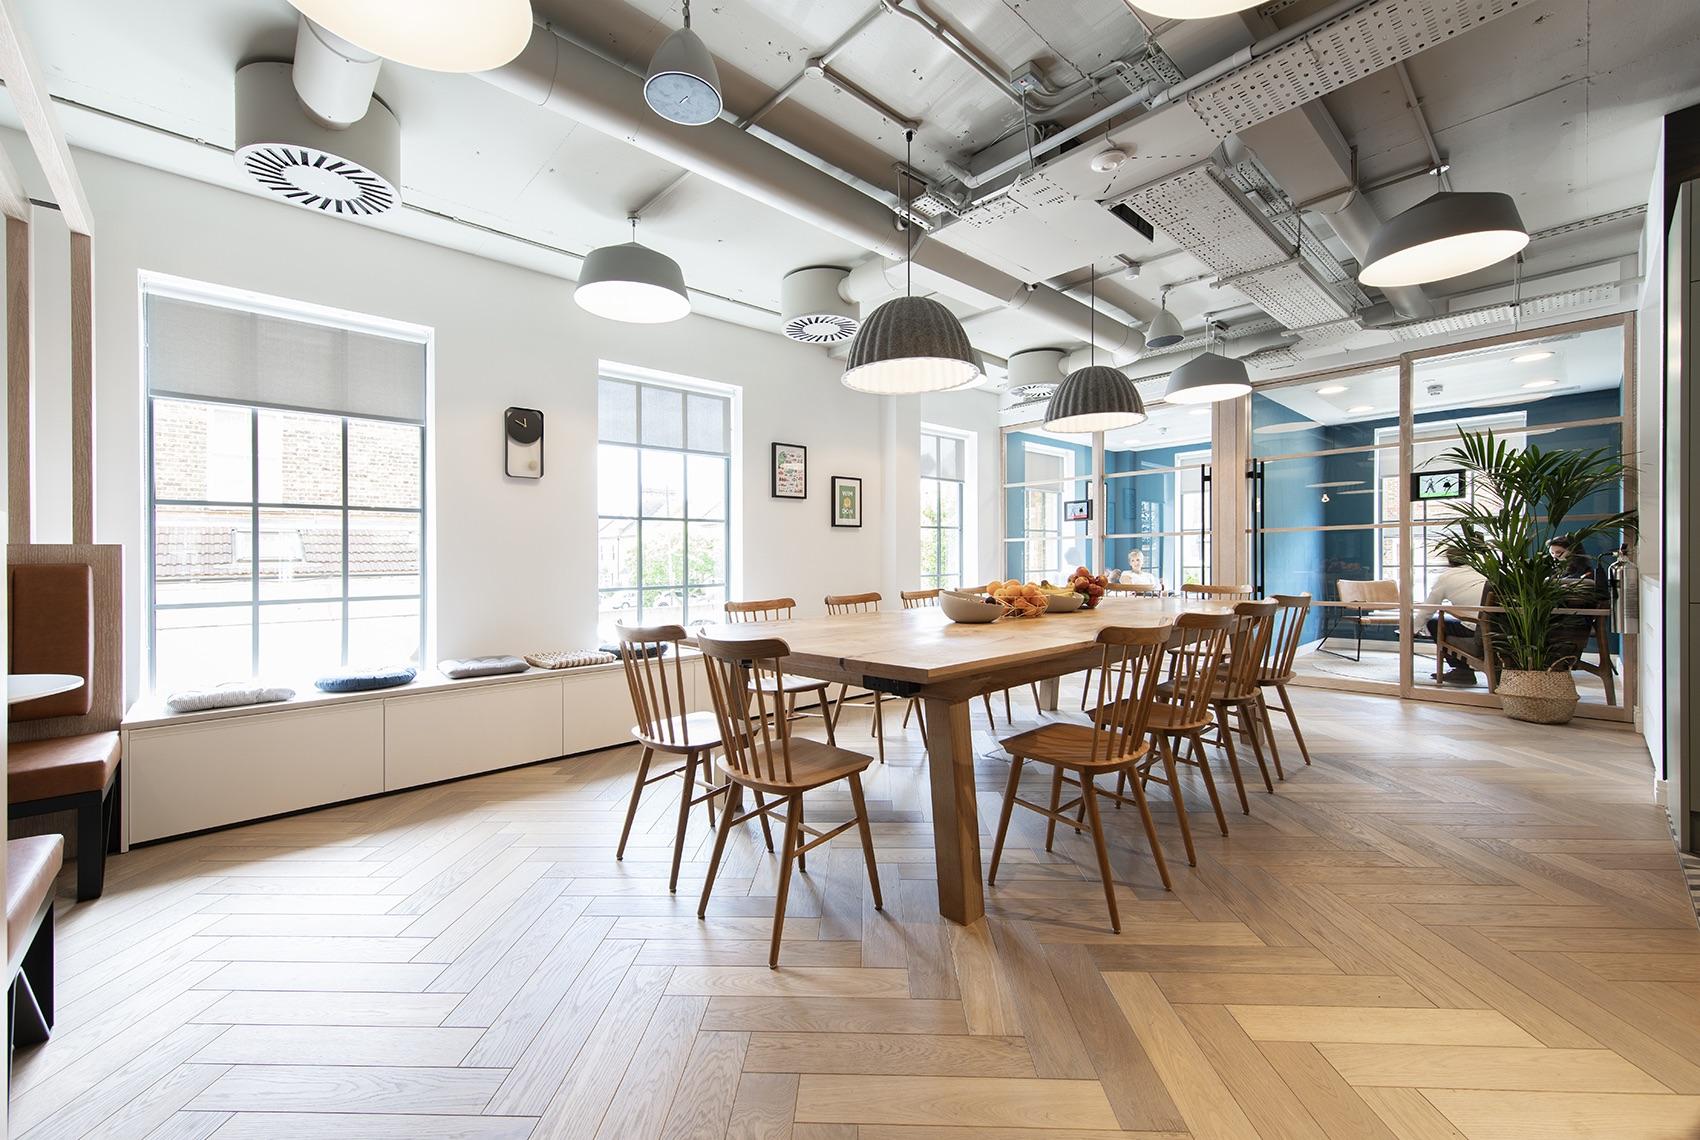 peldon-rose-new-office-london-16